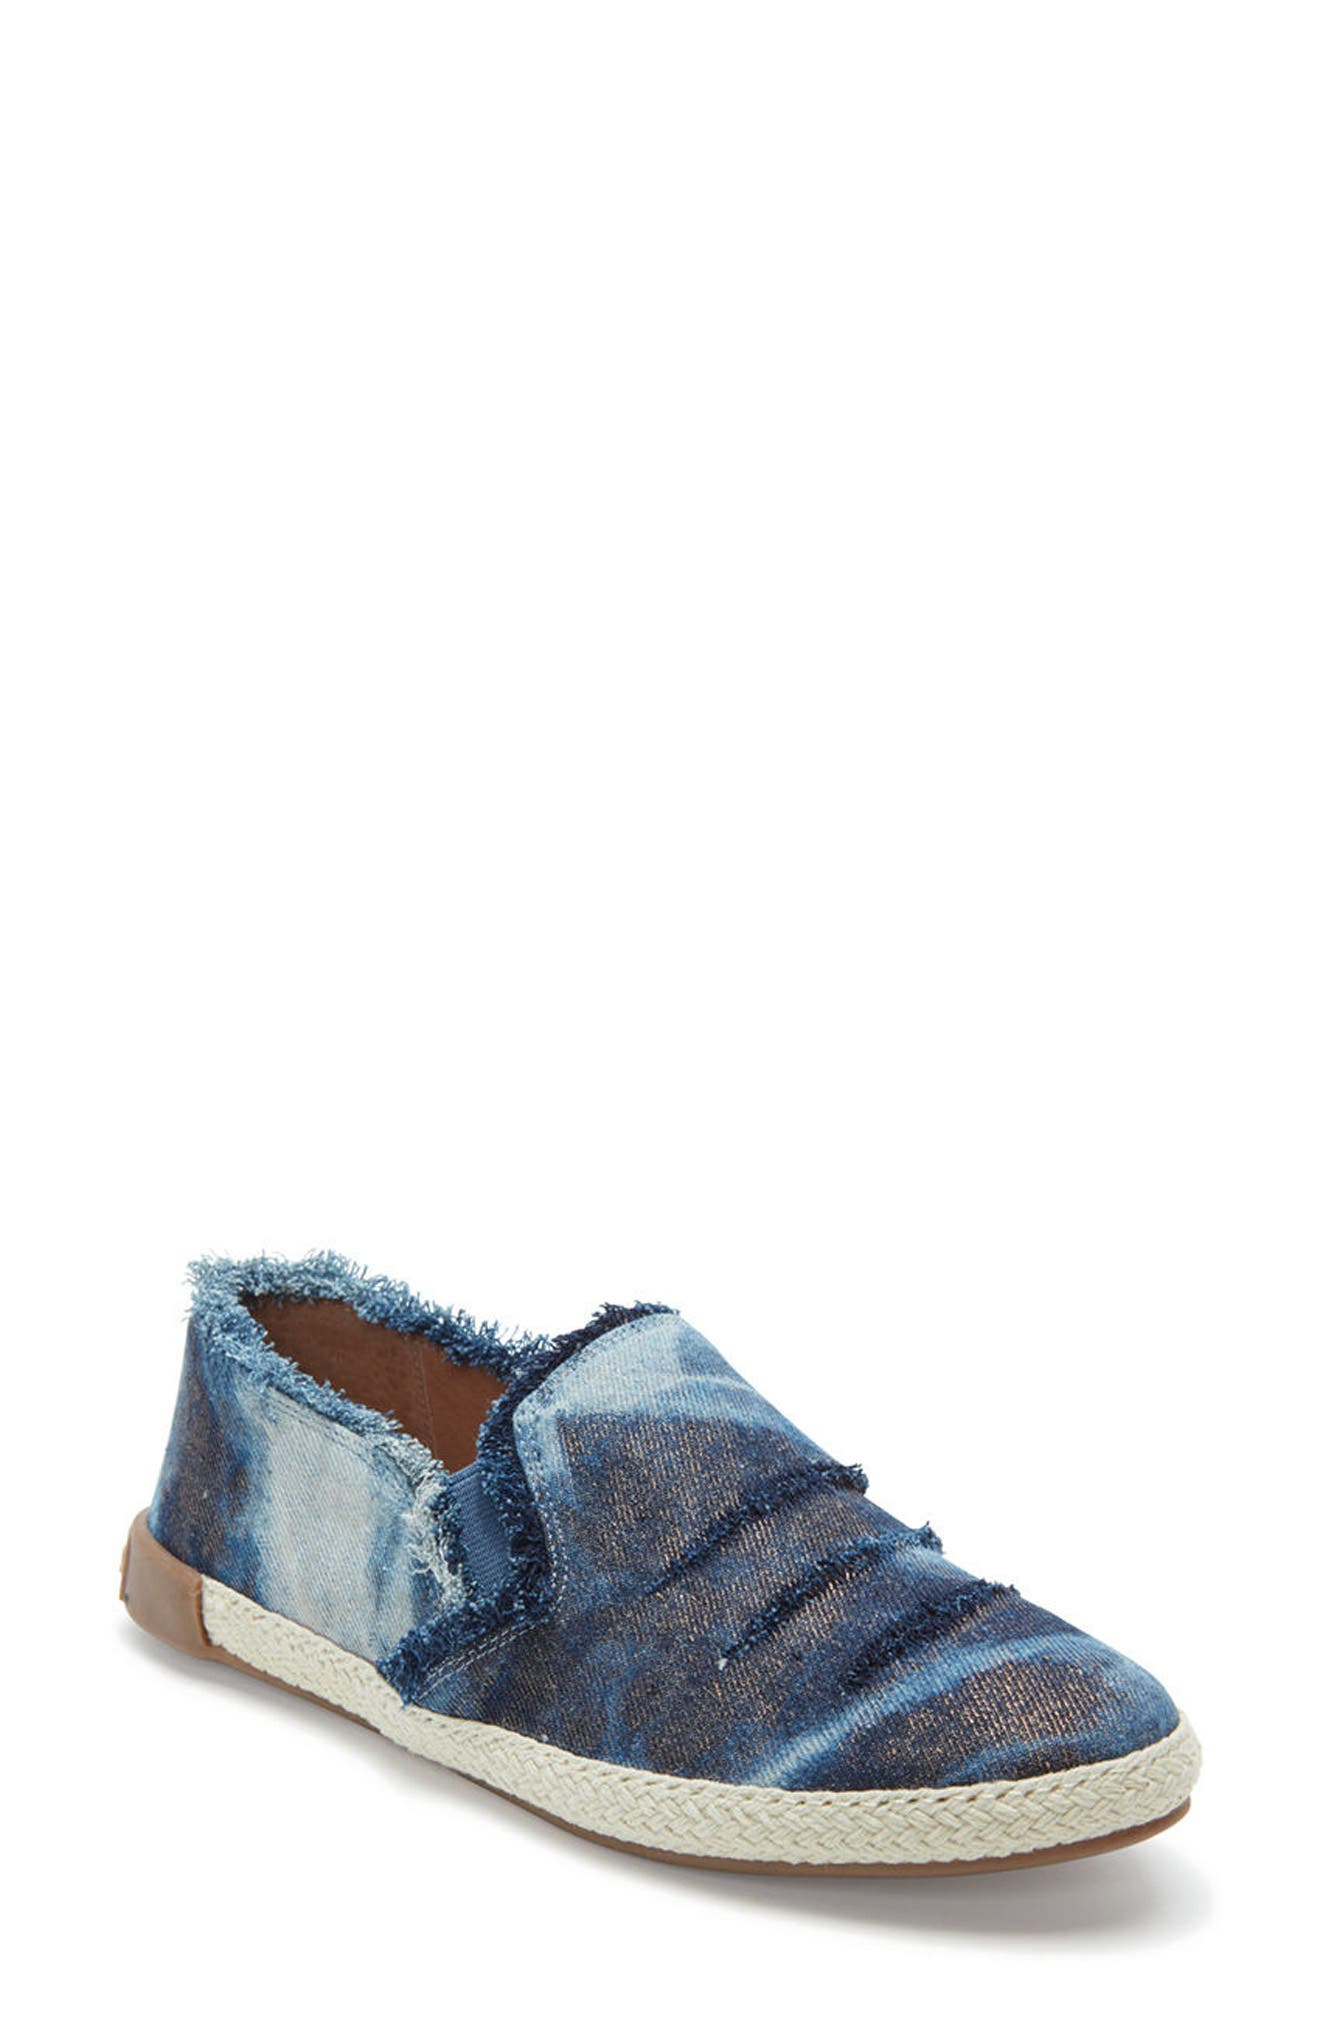 Adam Tucker Marin Slip-On Sneaker,                             Main thumbnail 1, color,                             Blue Champagne Denim Fabric